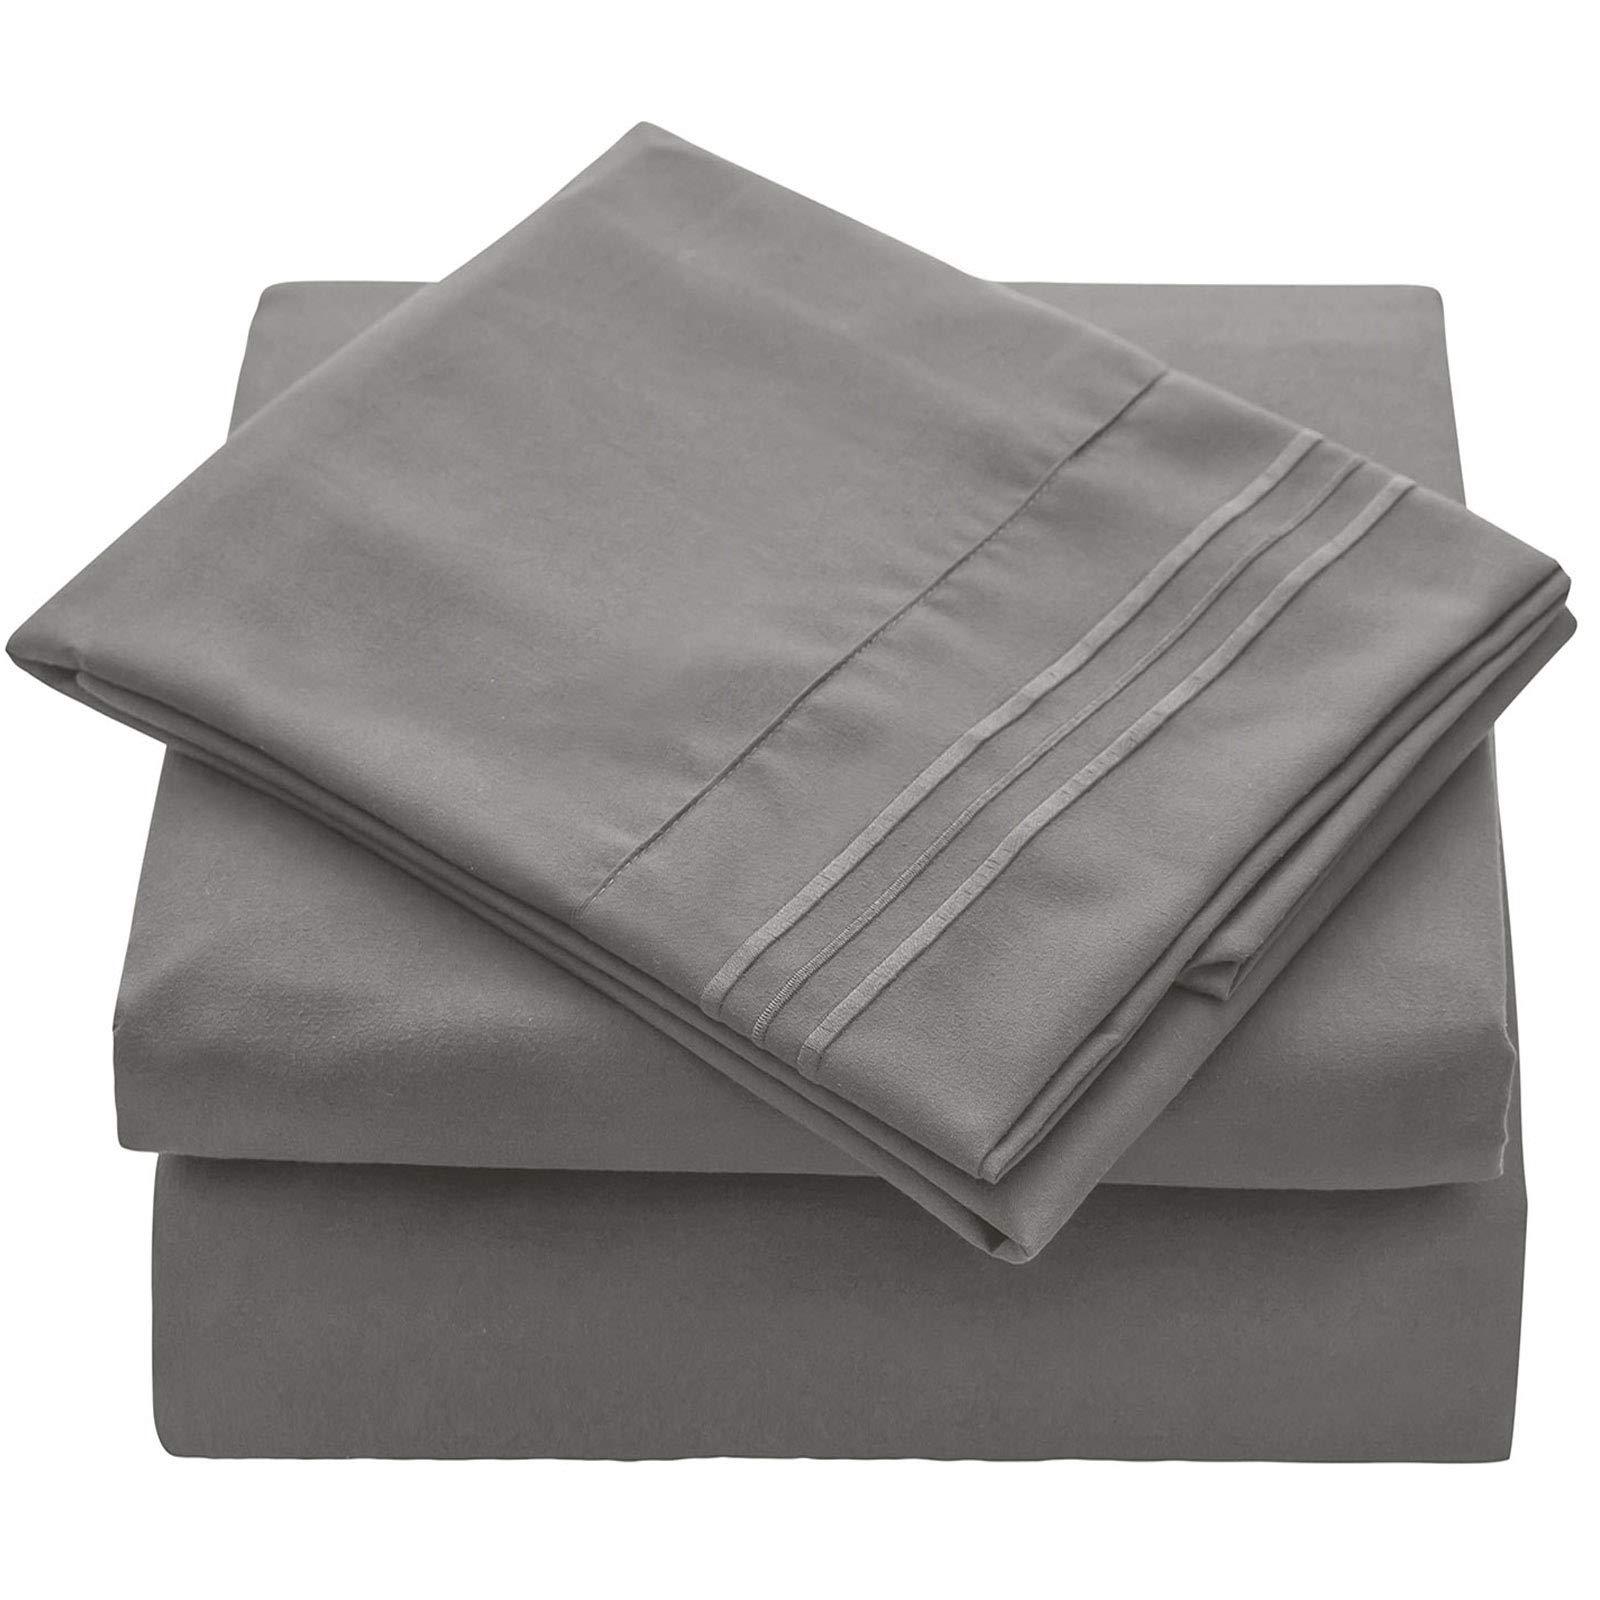 VEEYOO King Size Bed Sheet Set - 4 Piece Super Soft Brushed Microfiber 1800 Thread Count Hotel Luxury Sheets Set - Breathable, Wrinkle, Fade Resistant Deep Pocket Bedding Sheet Set, Silver